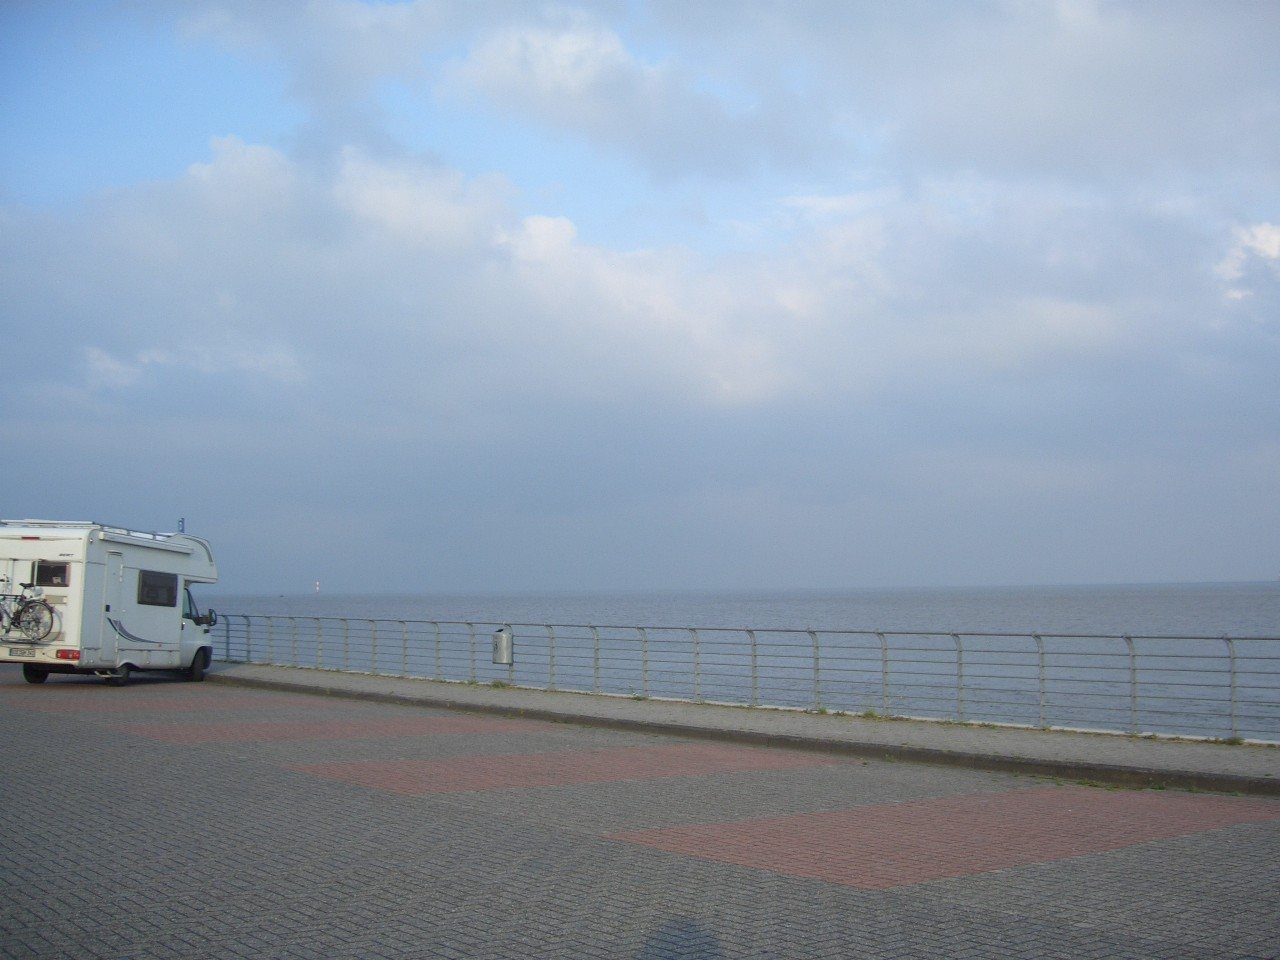 Ein anderer Stellplatz oberhalb des Meeres